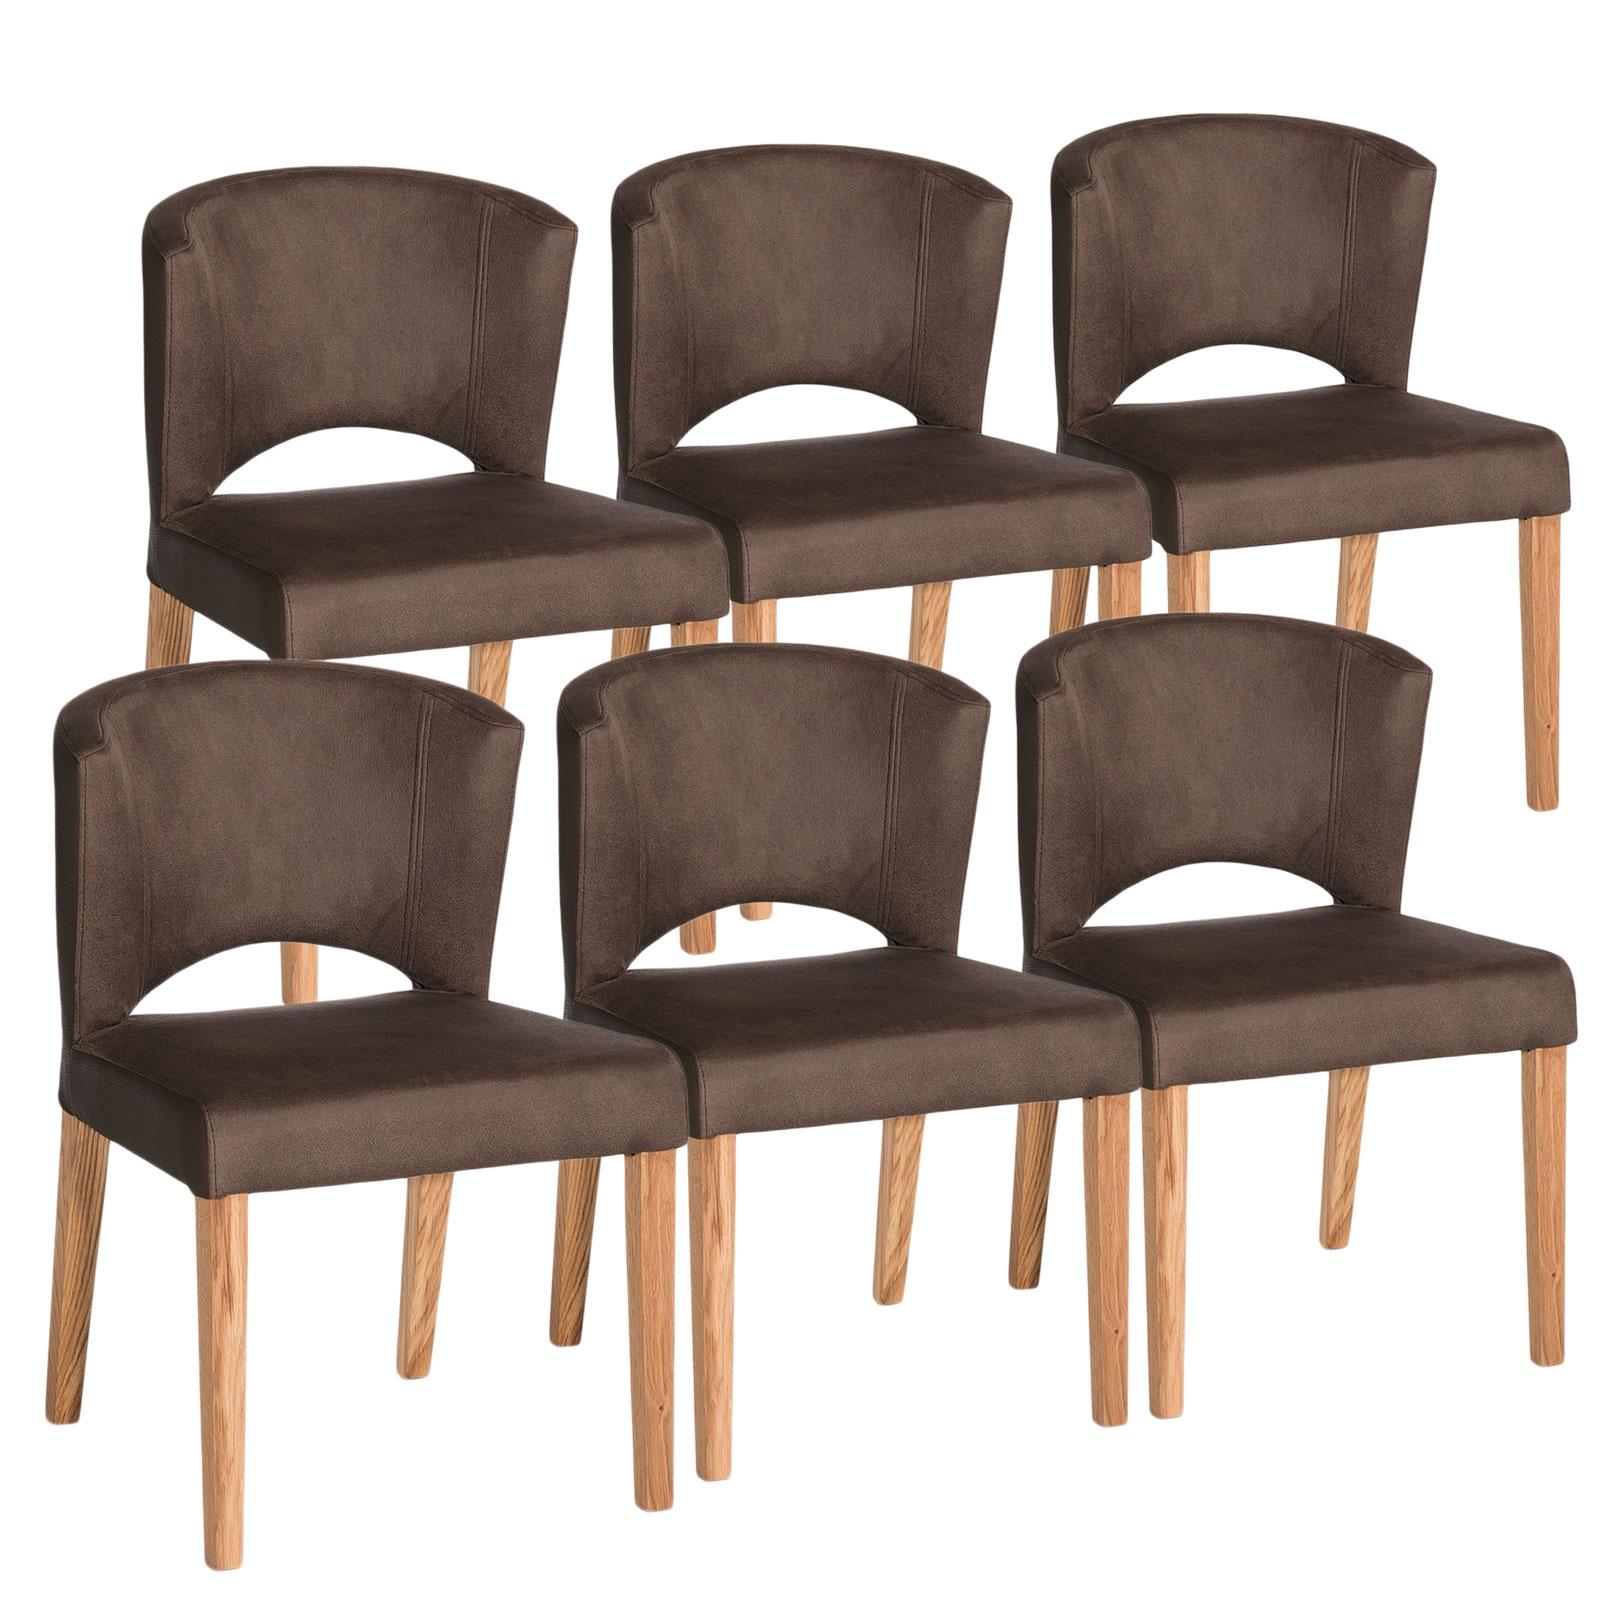 Esszimmer Stuhl Set Rimini 6 Stück Festgepolstert Microfaserbezug